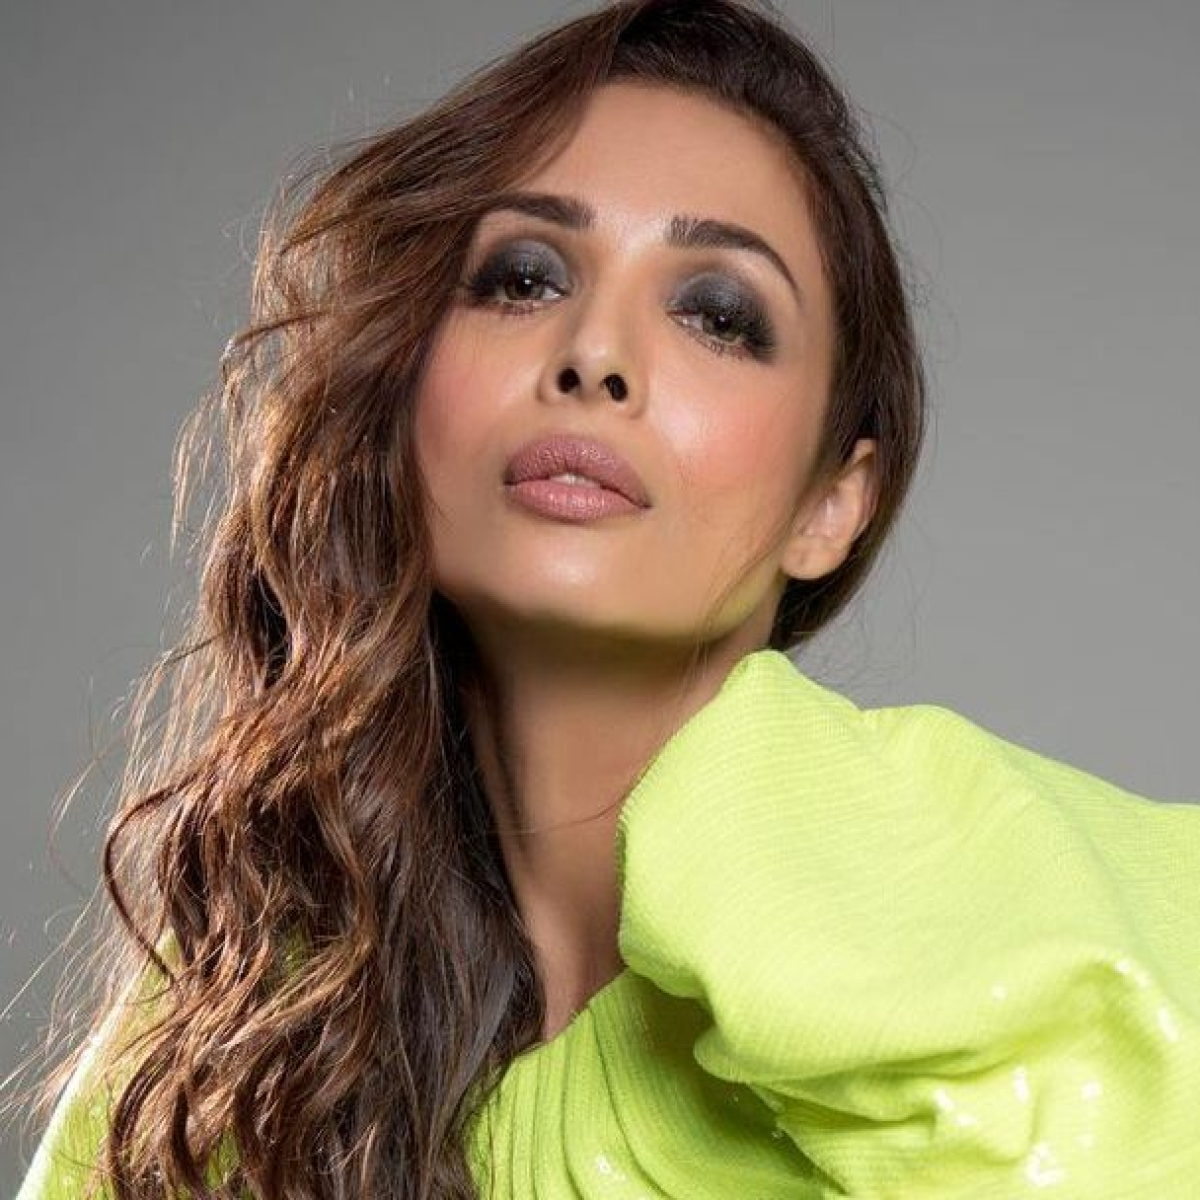 Throwback Thursday: When 'Chaiyya Chaiyya' star Malaika Arora was categorized as 'dark-skinned' in Bollywood